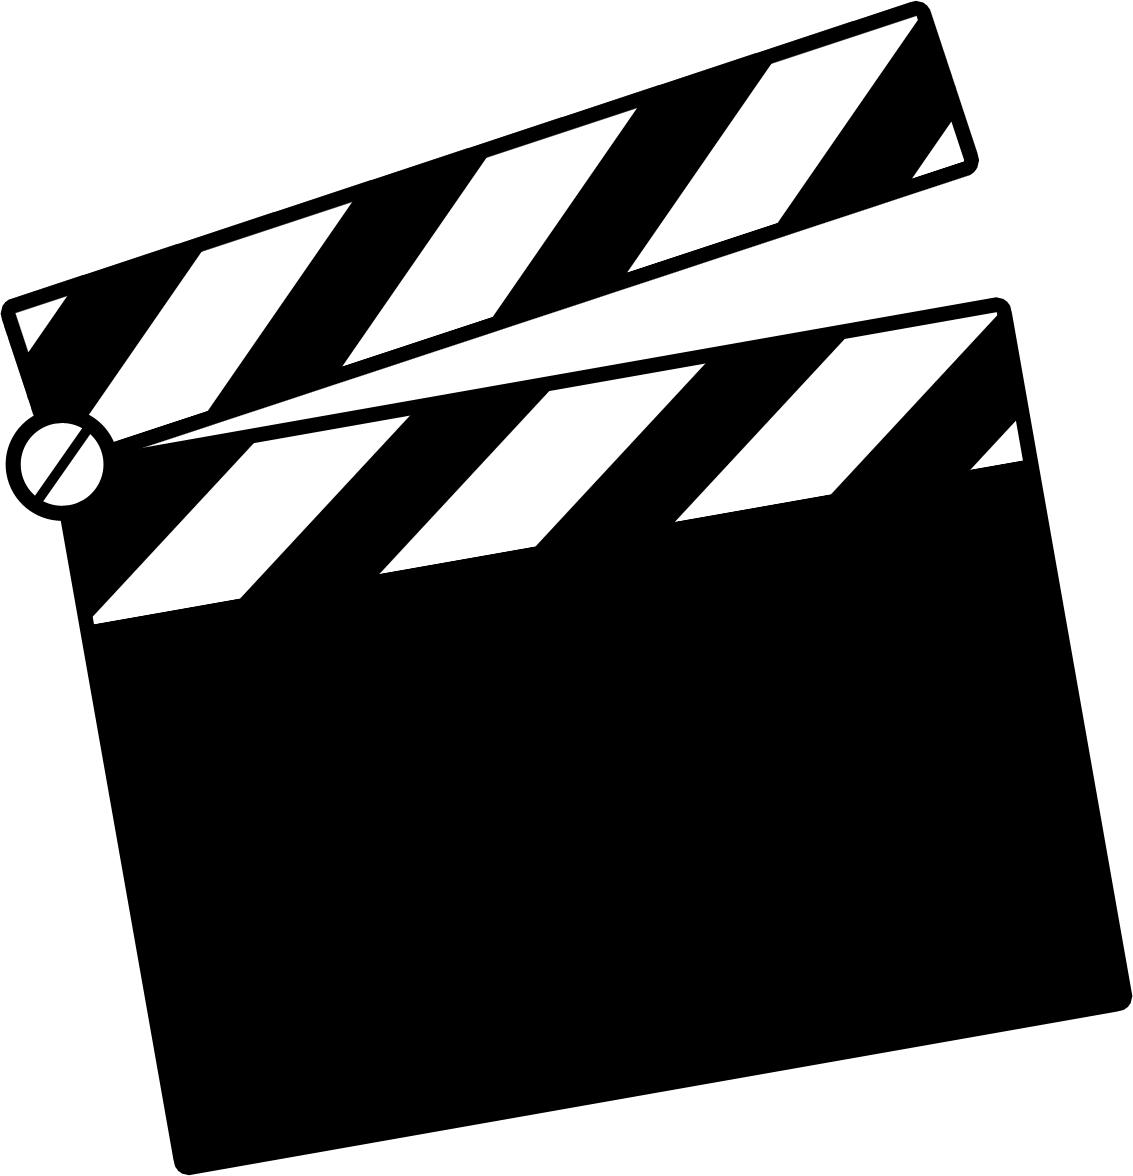 Director movie clapper clip art many interesting cliparts